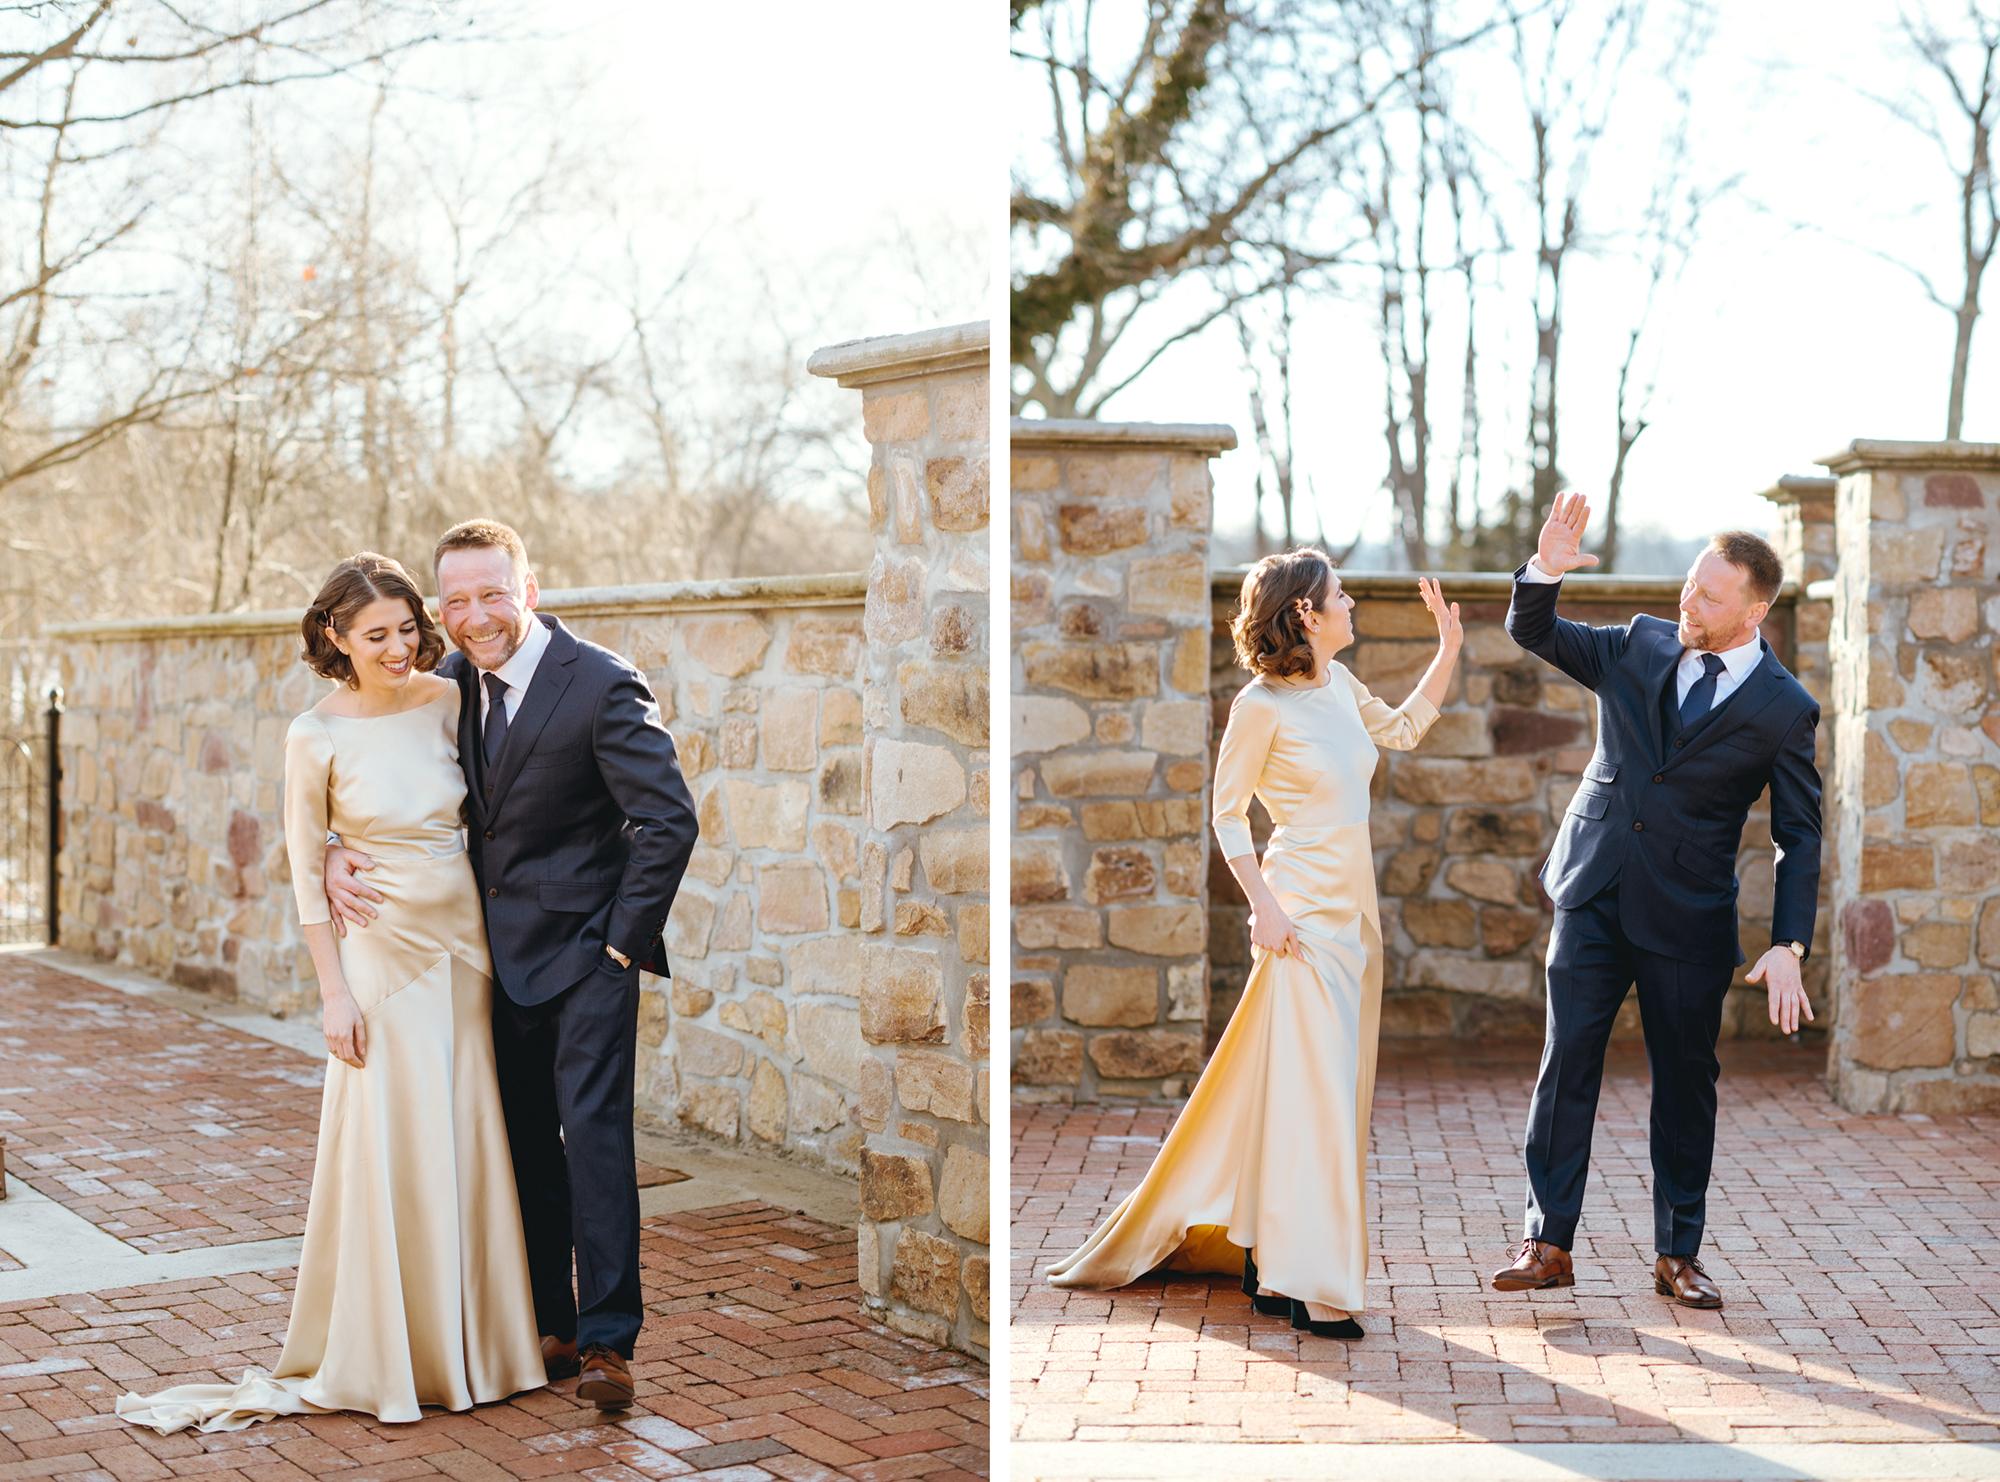 Hotel-du-village-wedding-winter-february-peaberry-photography-philadelphia-photographer-022.jpg